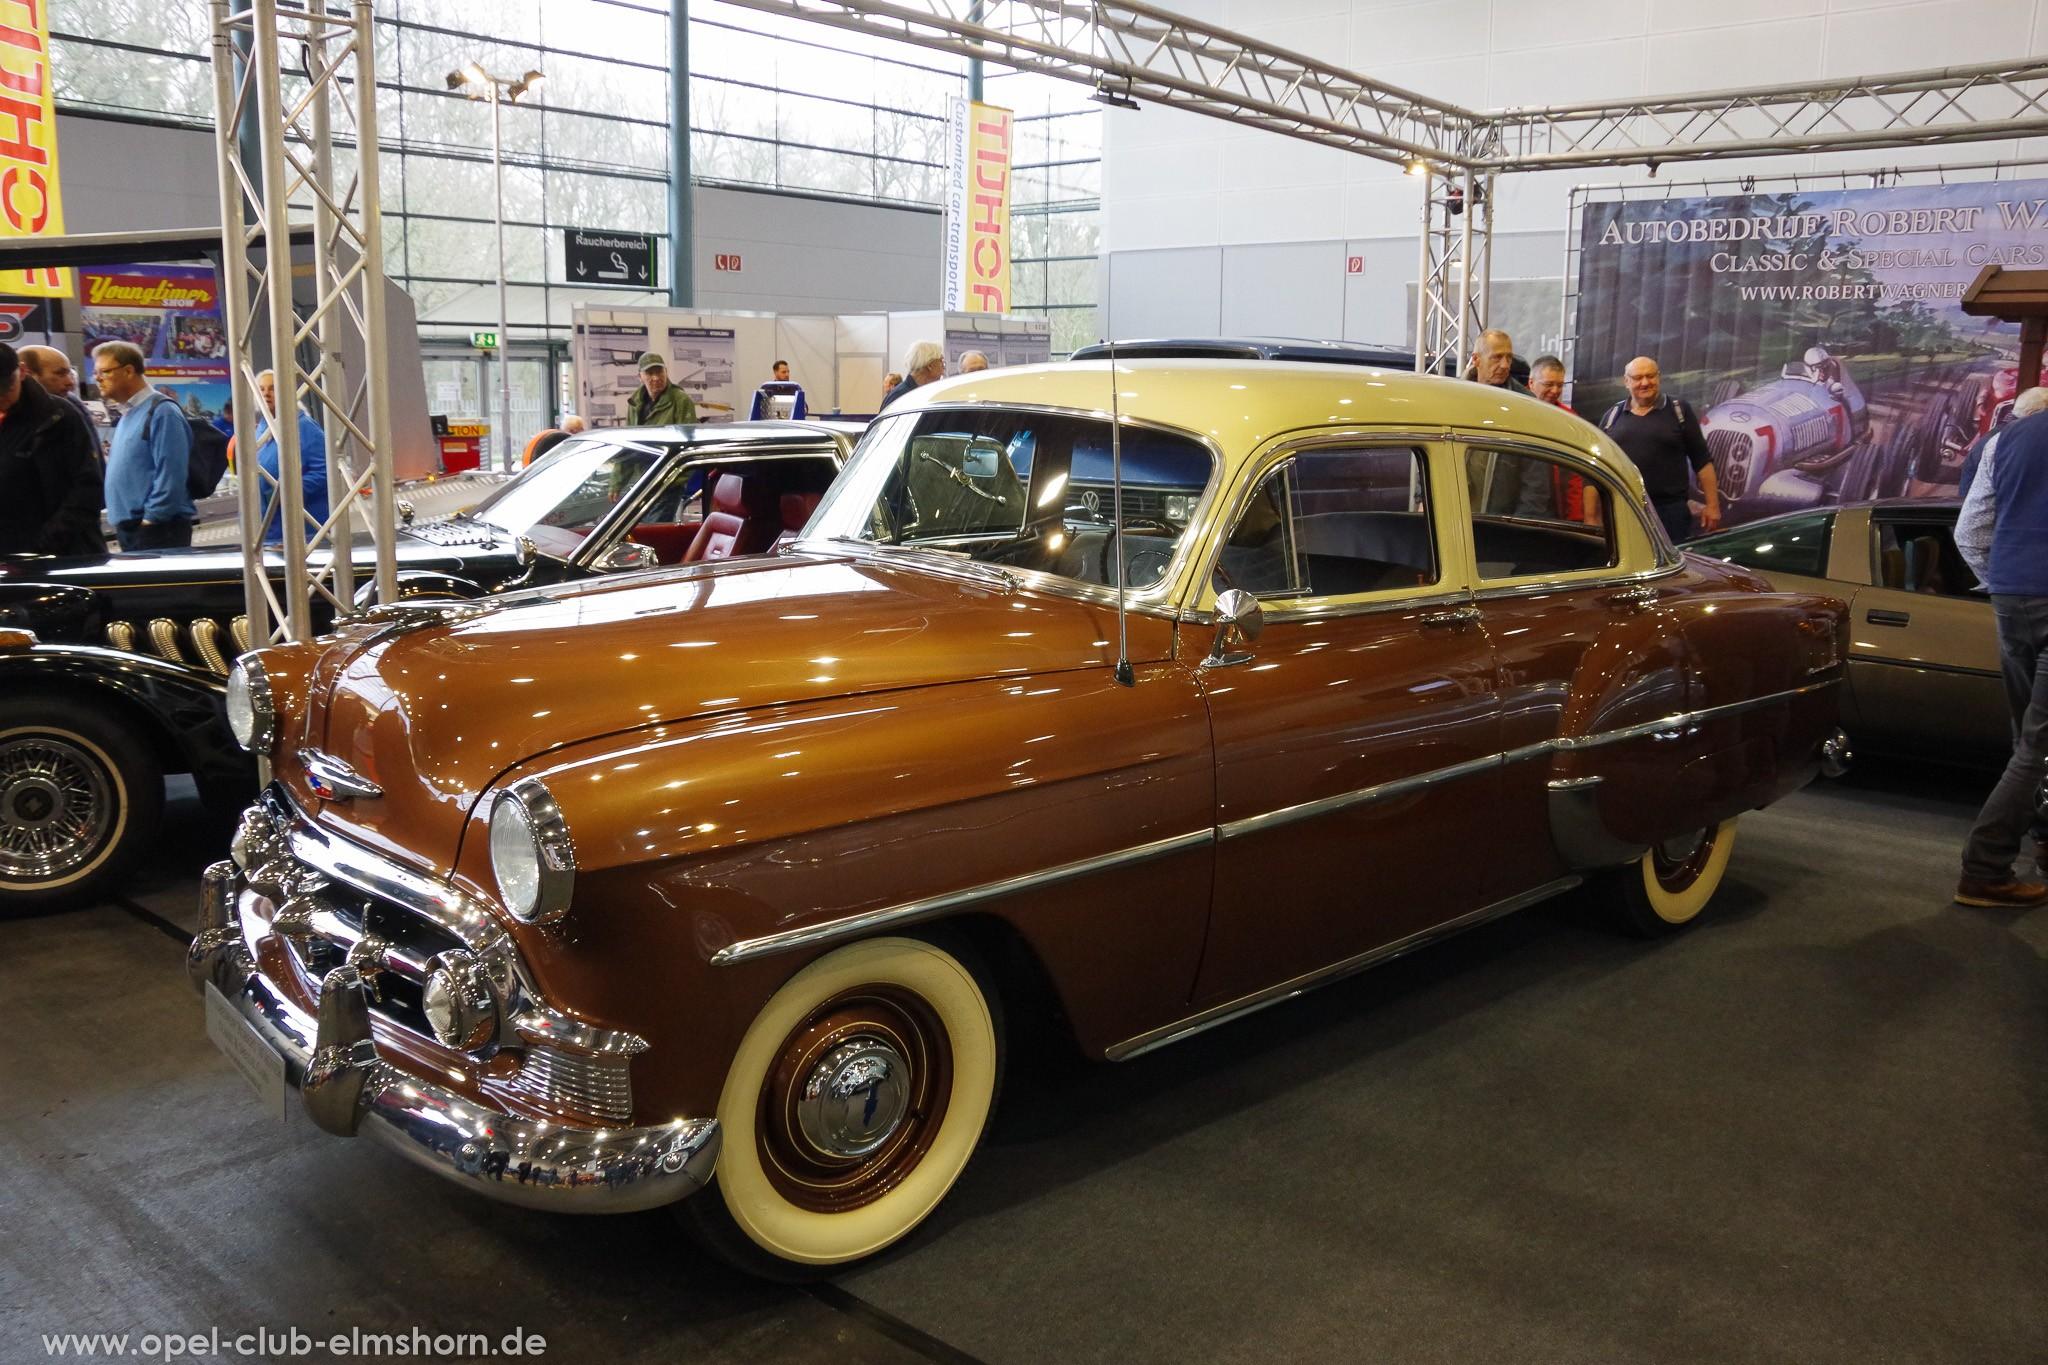 2020-02-02-Bremen-Classic-Motorshow-2020-20200201_124307-_